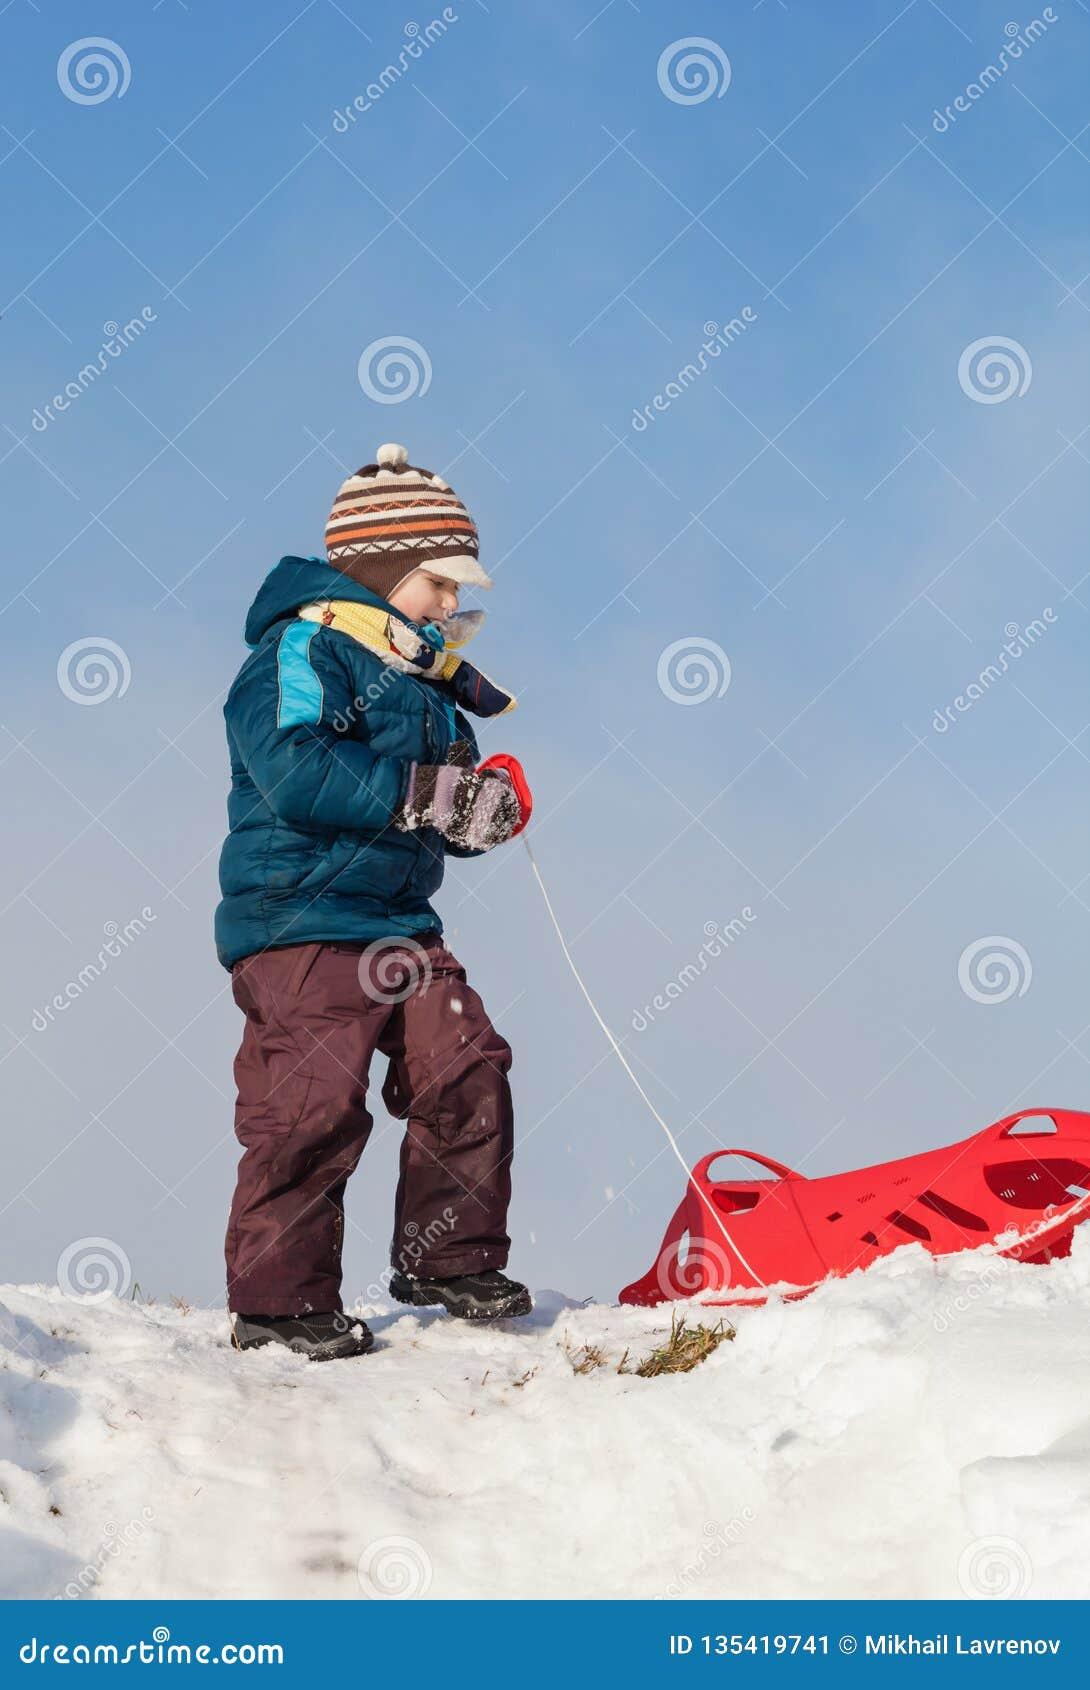 Muchacho que tira del trineo plástico rojo a una colina nevosa